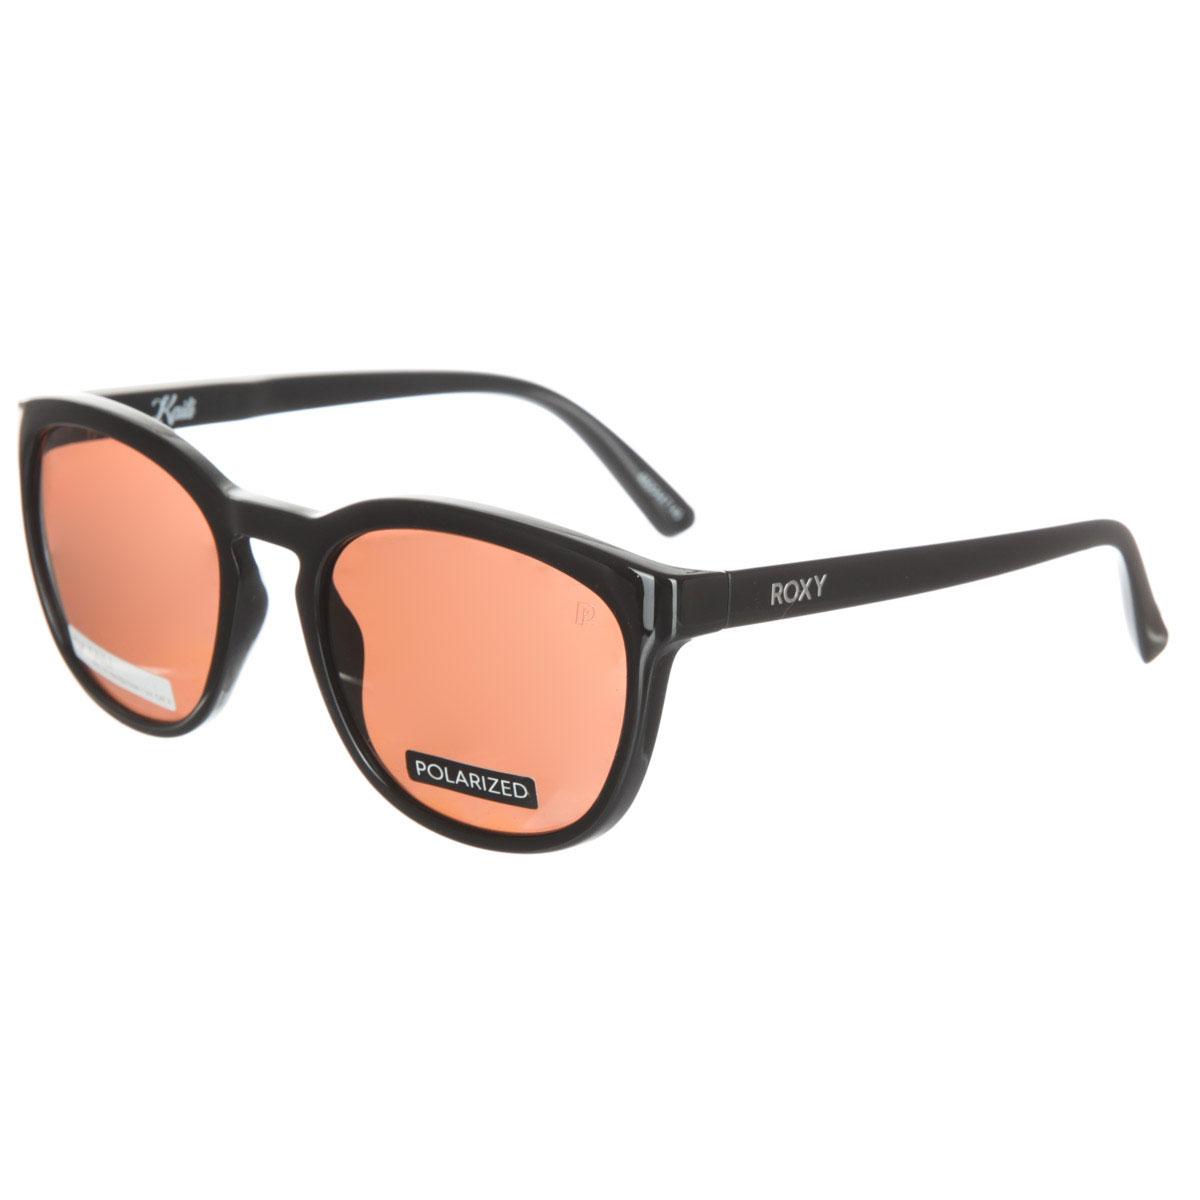 2630303b4b Купить очки женские Roxy Kaili Polarized Shiny Black Purple  (ERJEY03077-XKKP) в интернет-магазине Proskater.kz